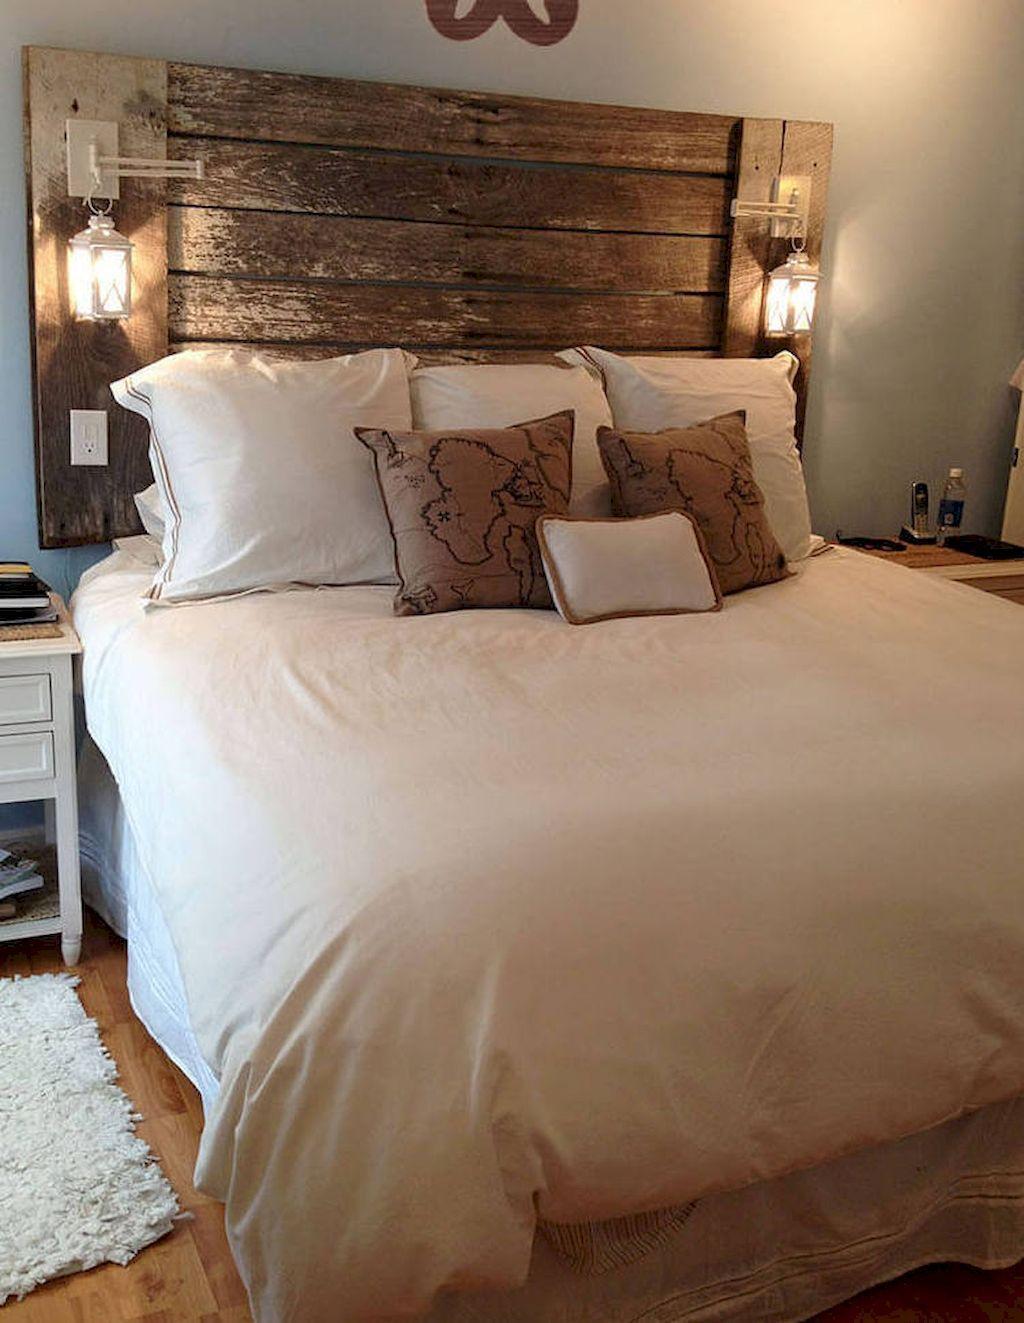 Master bedroom headboard ideas   Urban Farmhouse Master Bedroom Remodel Ideas  Bedroom Design and